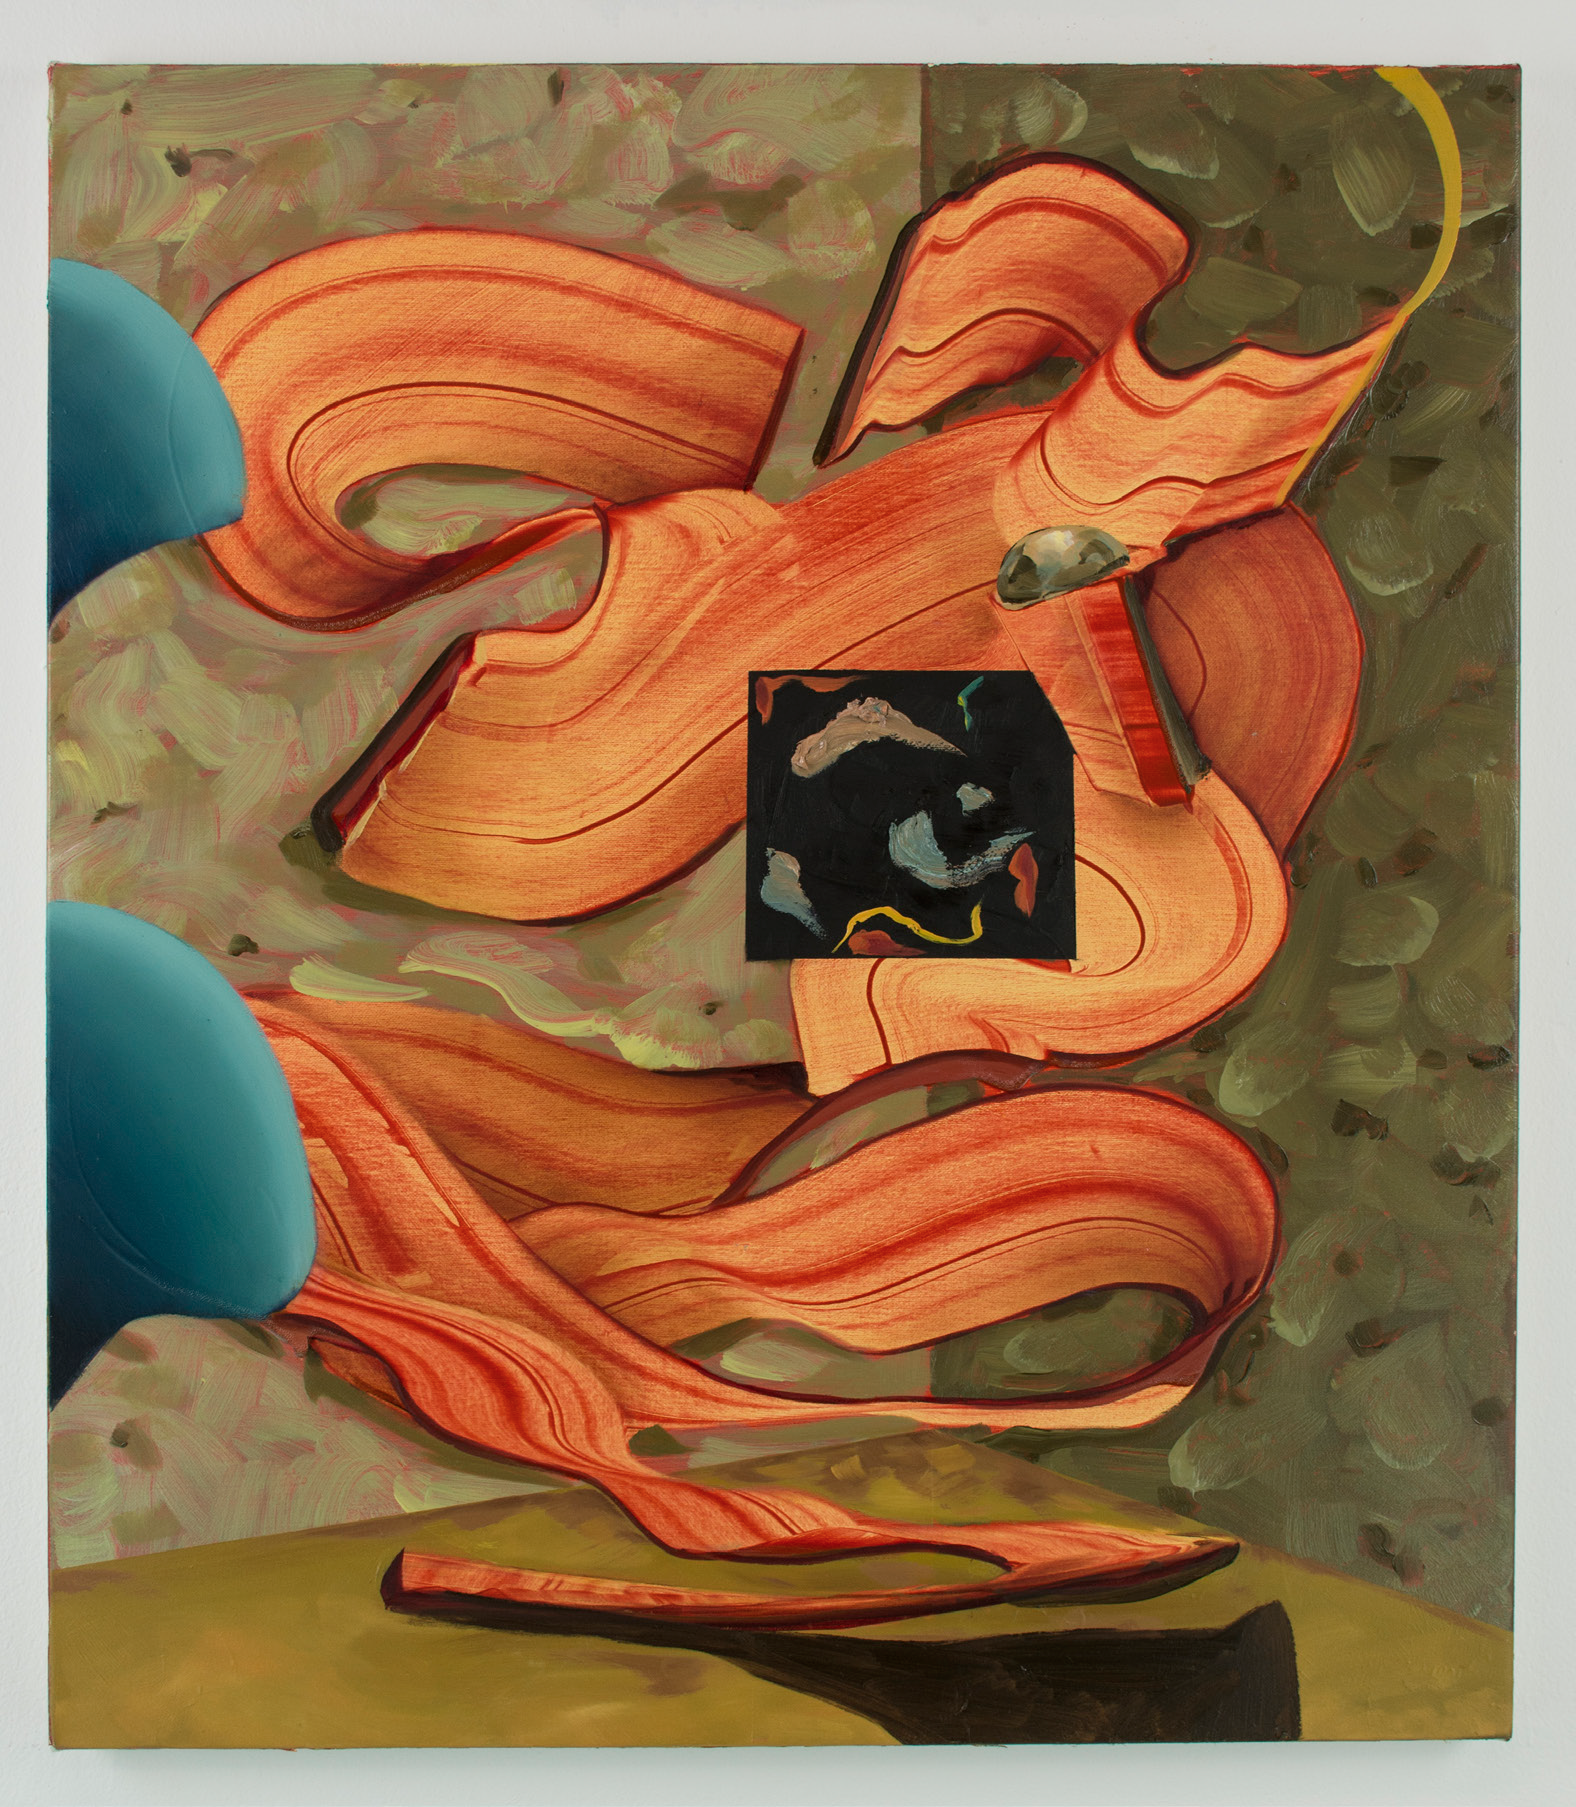 D. Flood, ' Shape of Things',  oil on reversed black primed canvas, 80 x 100 cm